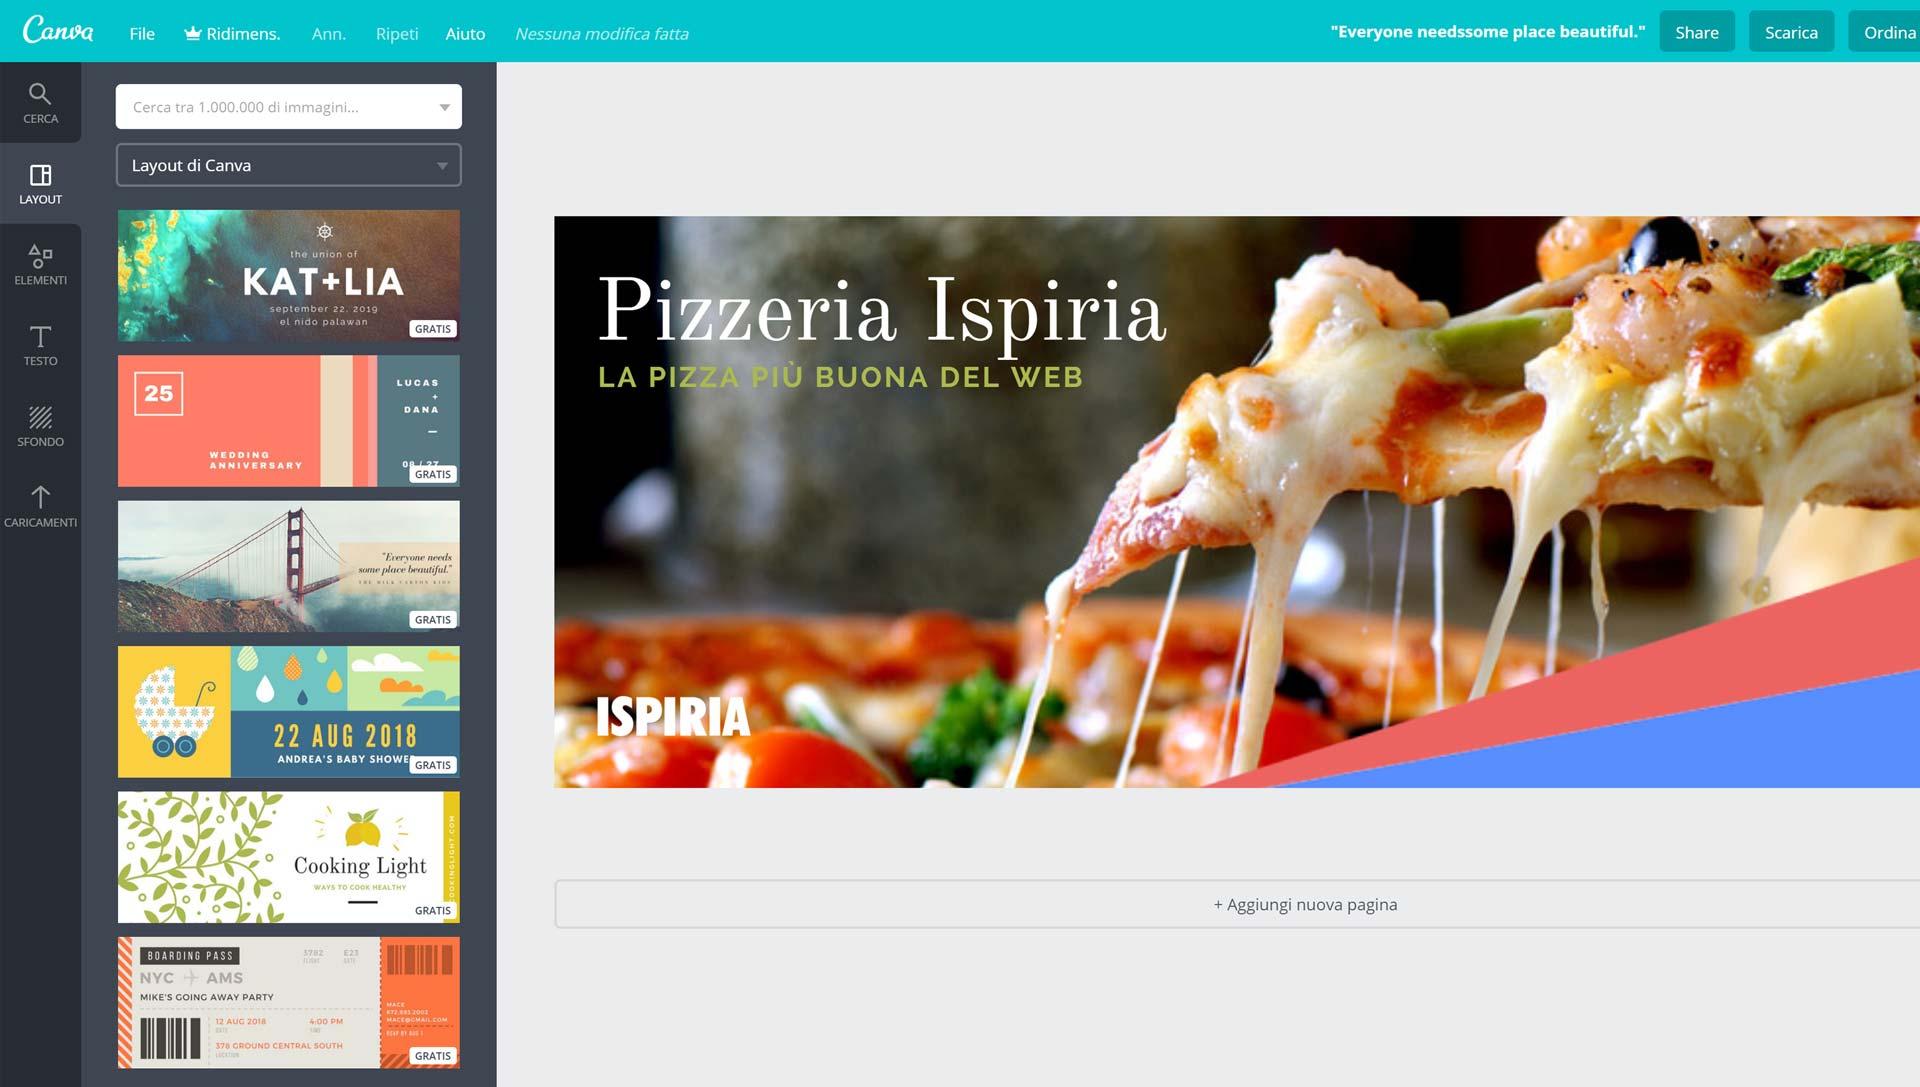 Creare Grafica Gratis Online Per Social